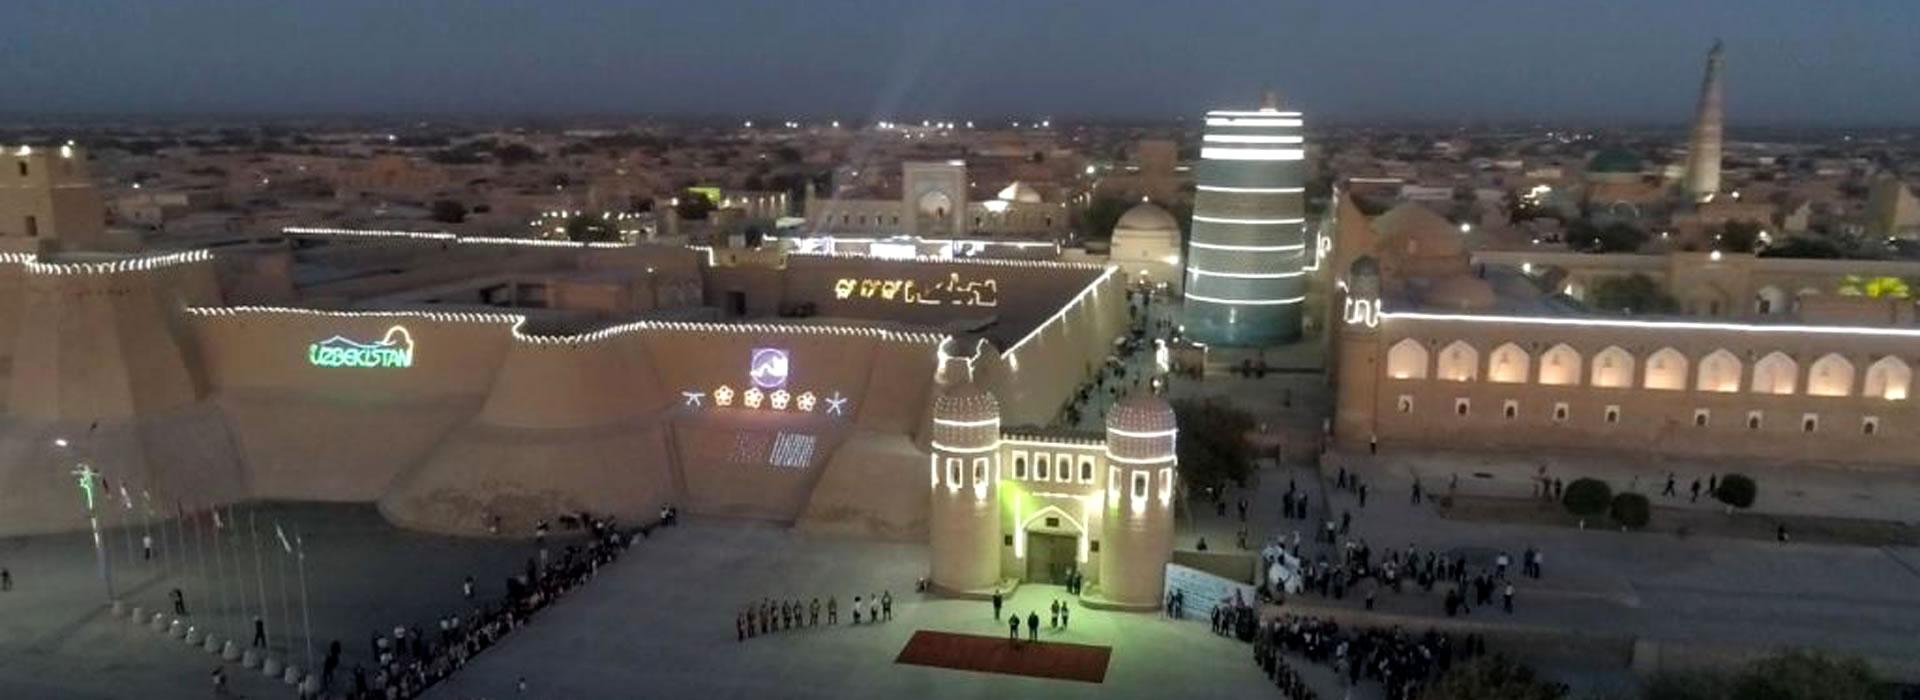 pic-banner-usbekistan-2019-02